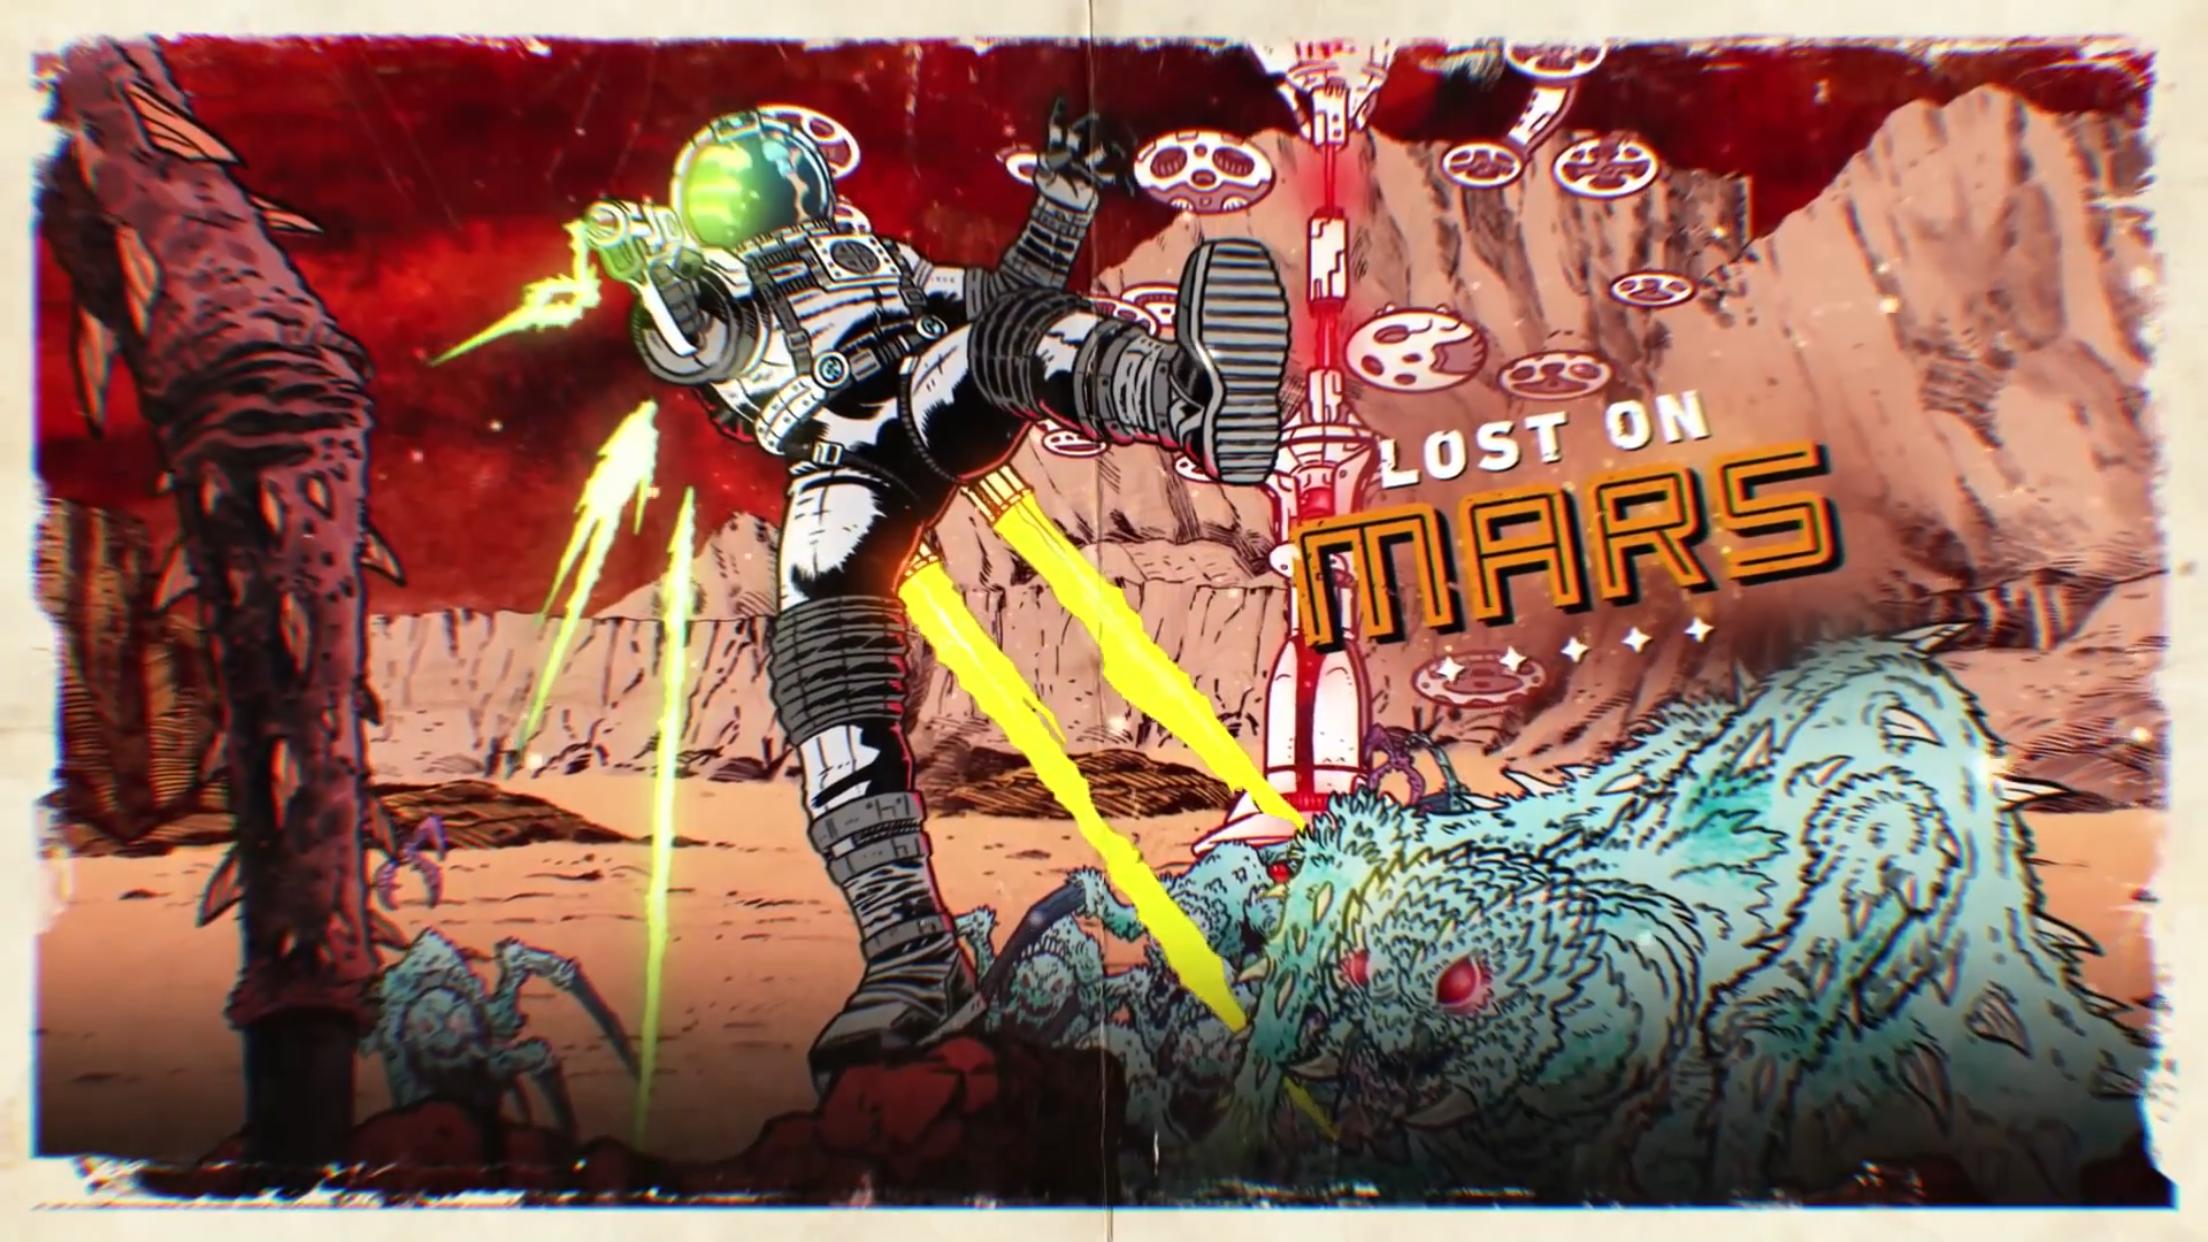 Far Cry 5 Dlc 2 Lost On Mars Far Cry 5 Crying Lost